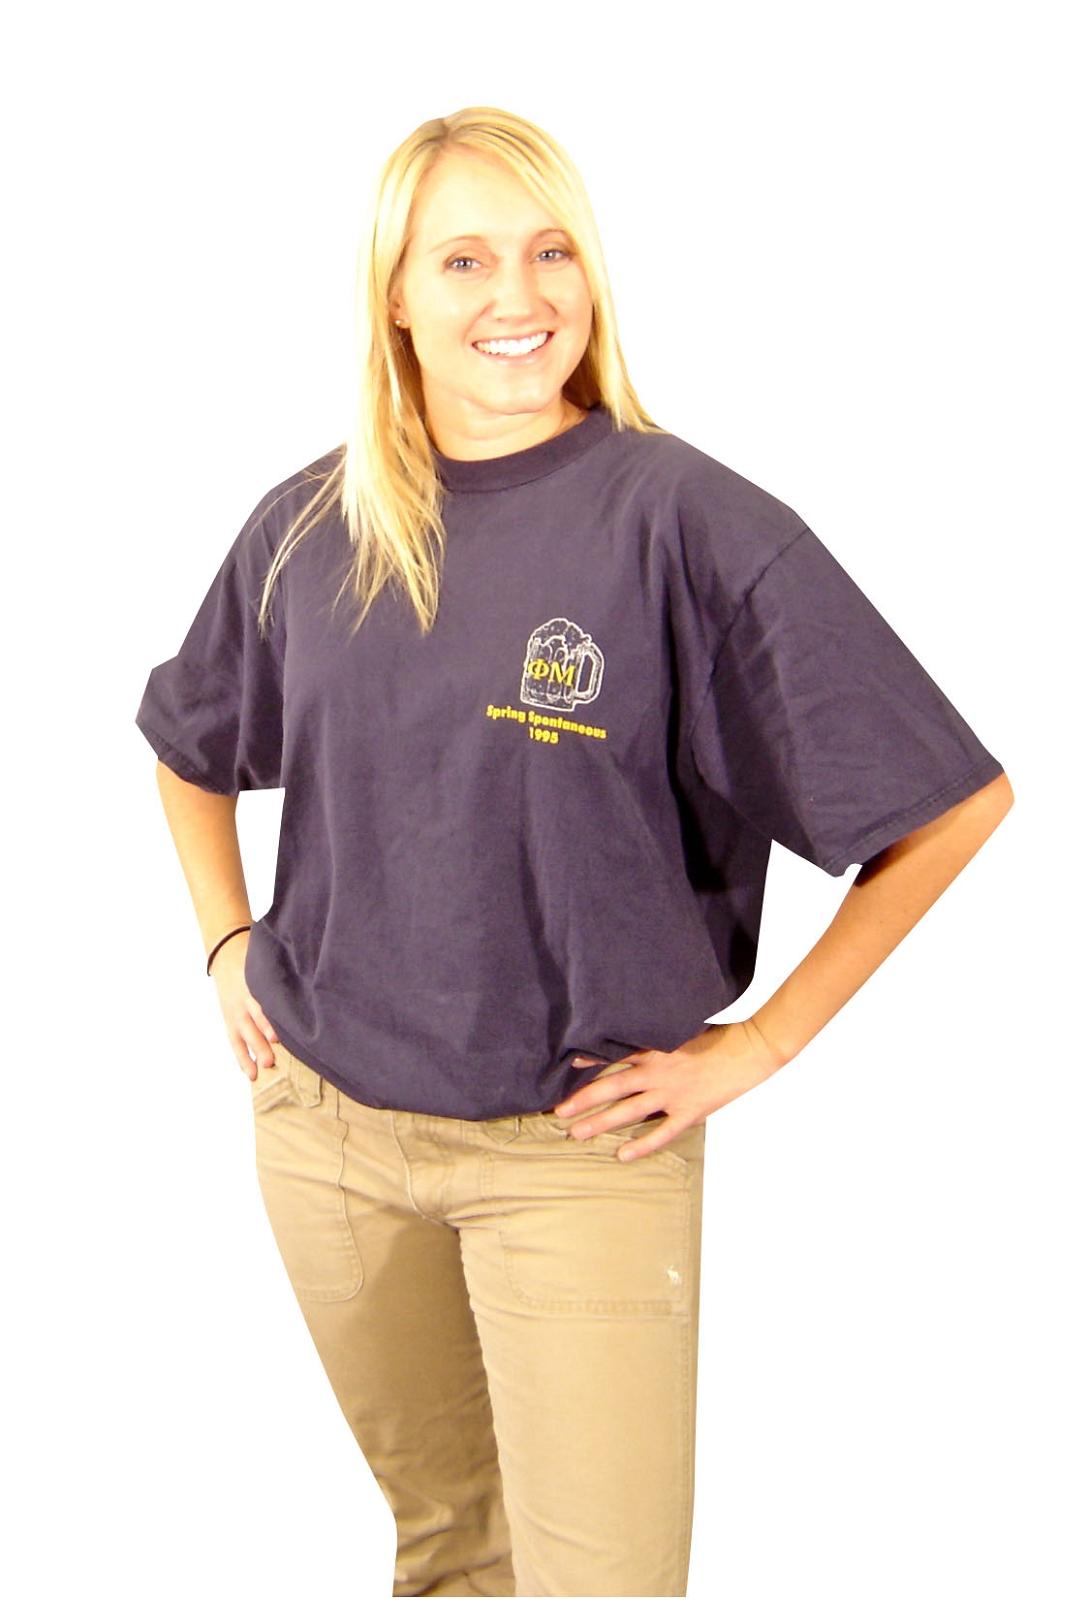 Wholesale Screen Printed T Shirts 18 Shirts Minimum